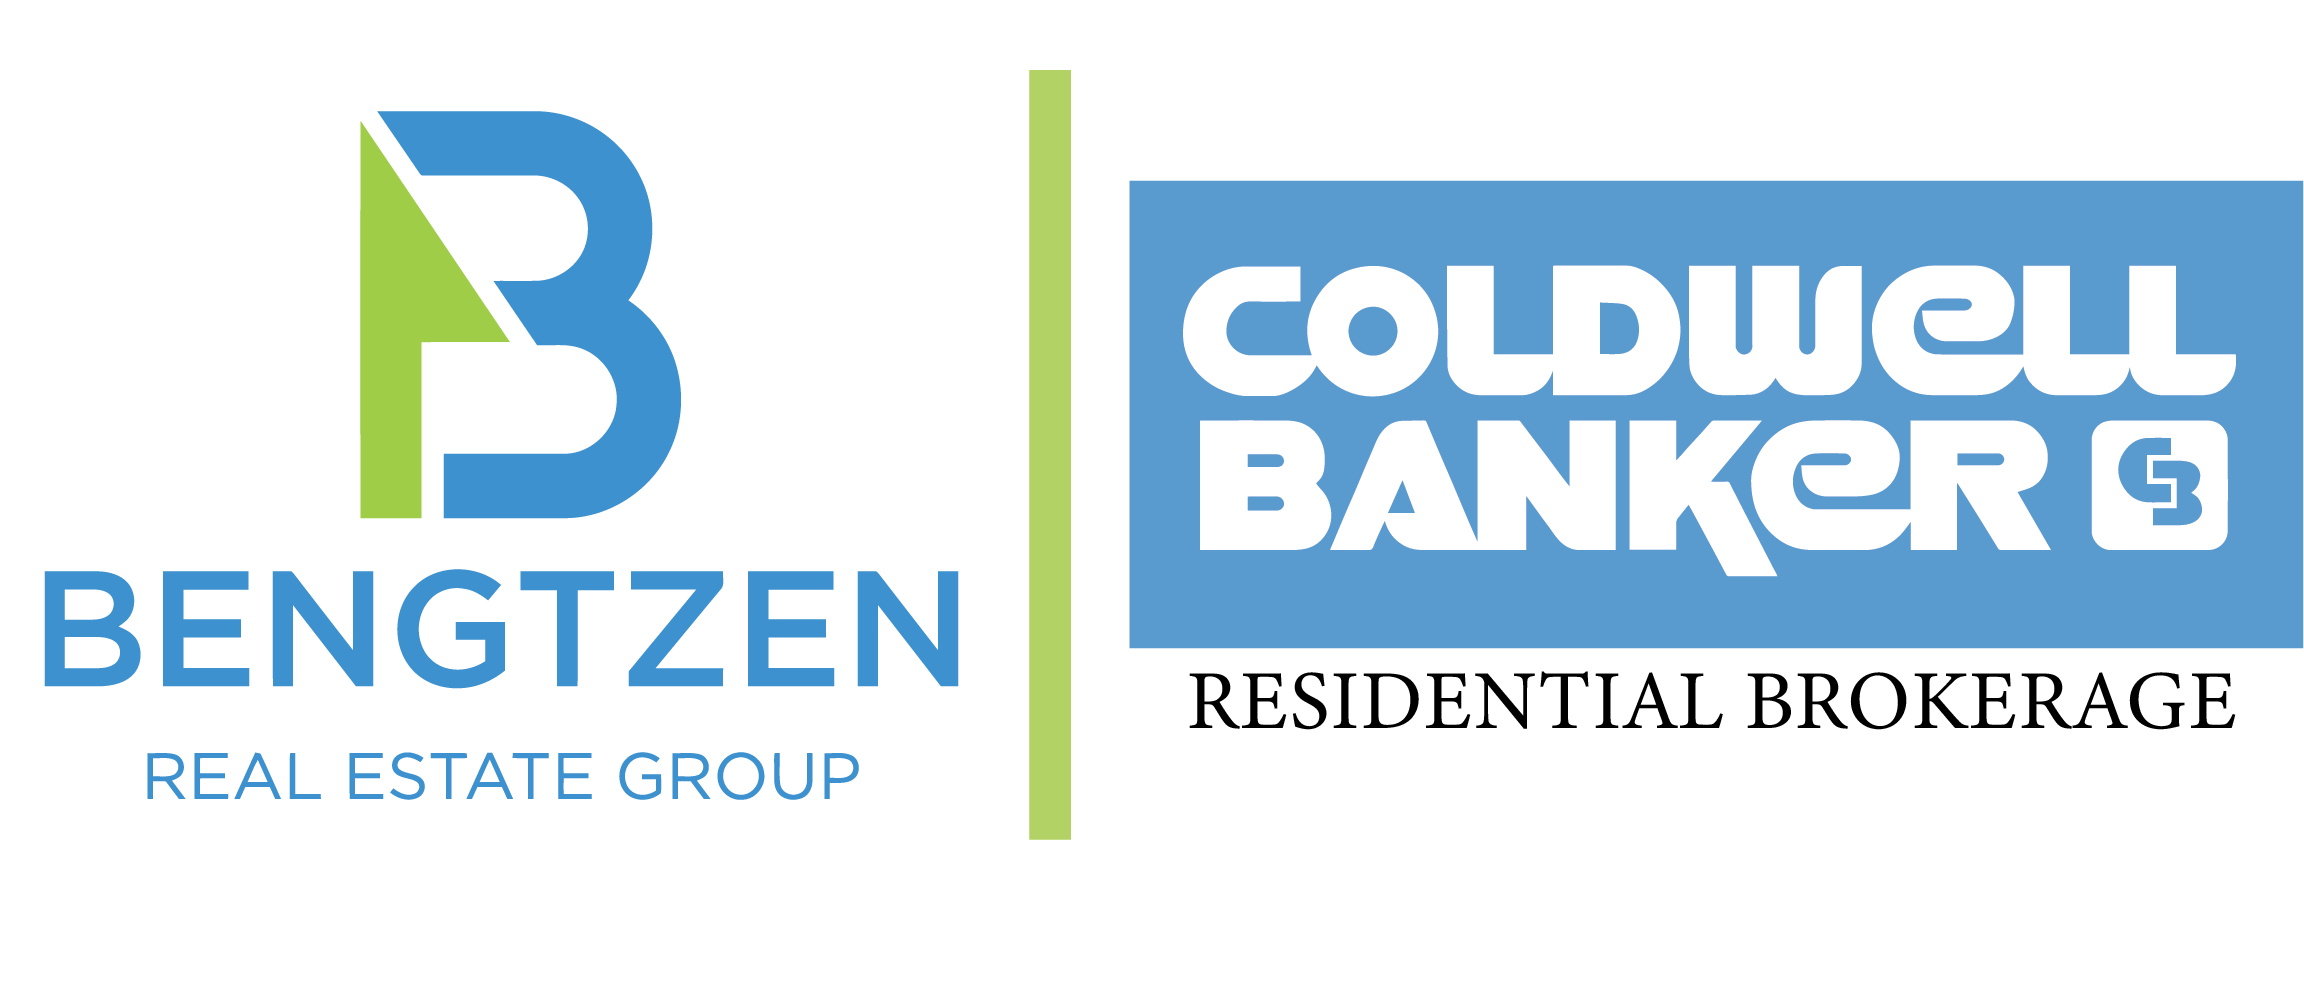 Bengtzen Real Estate Group | Coldwell Banker logo